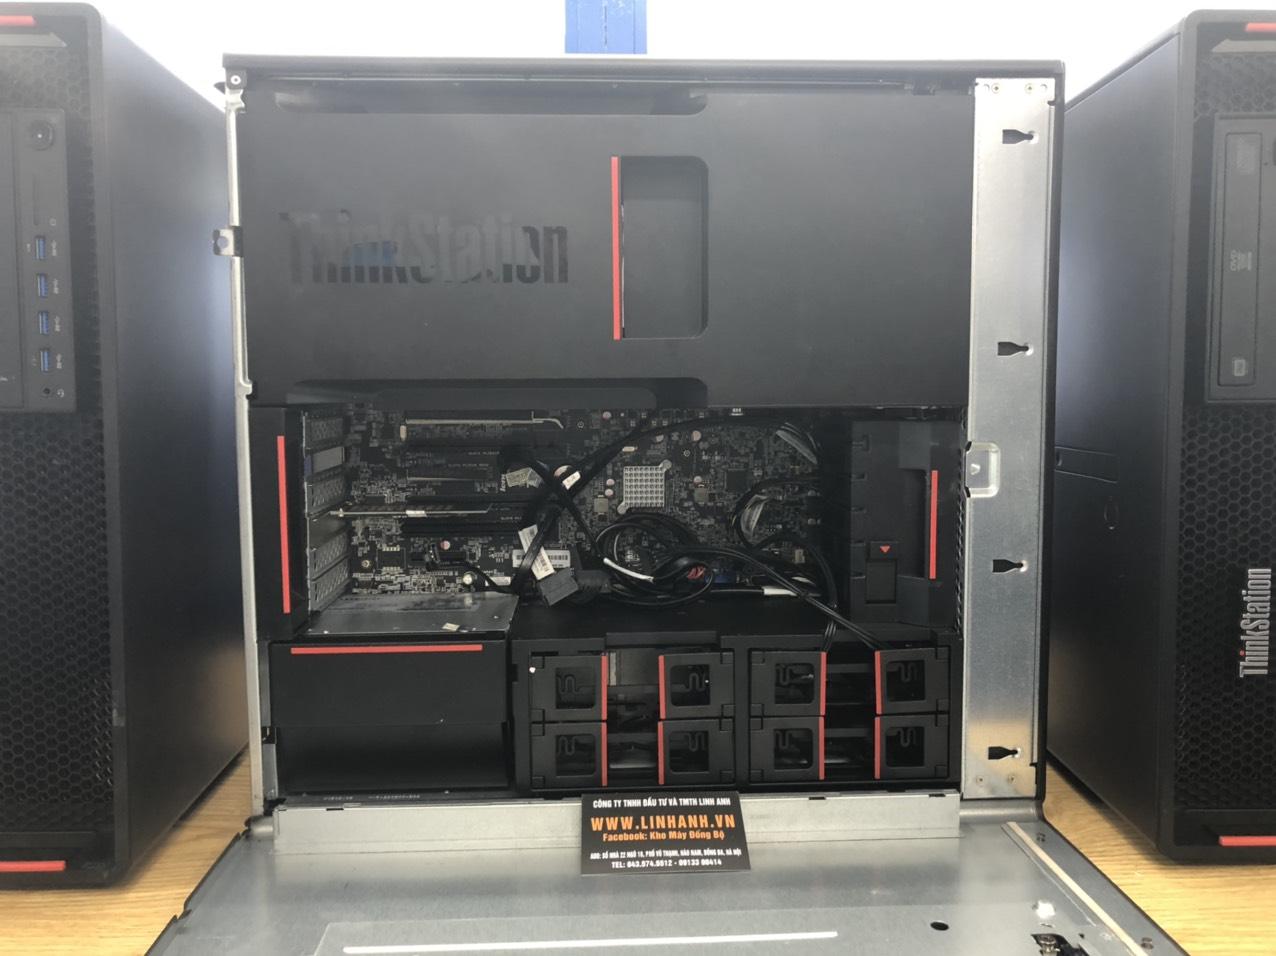 Lenovo Thinkstation P700 (01)